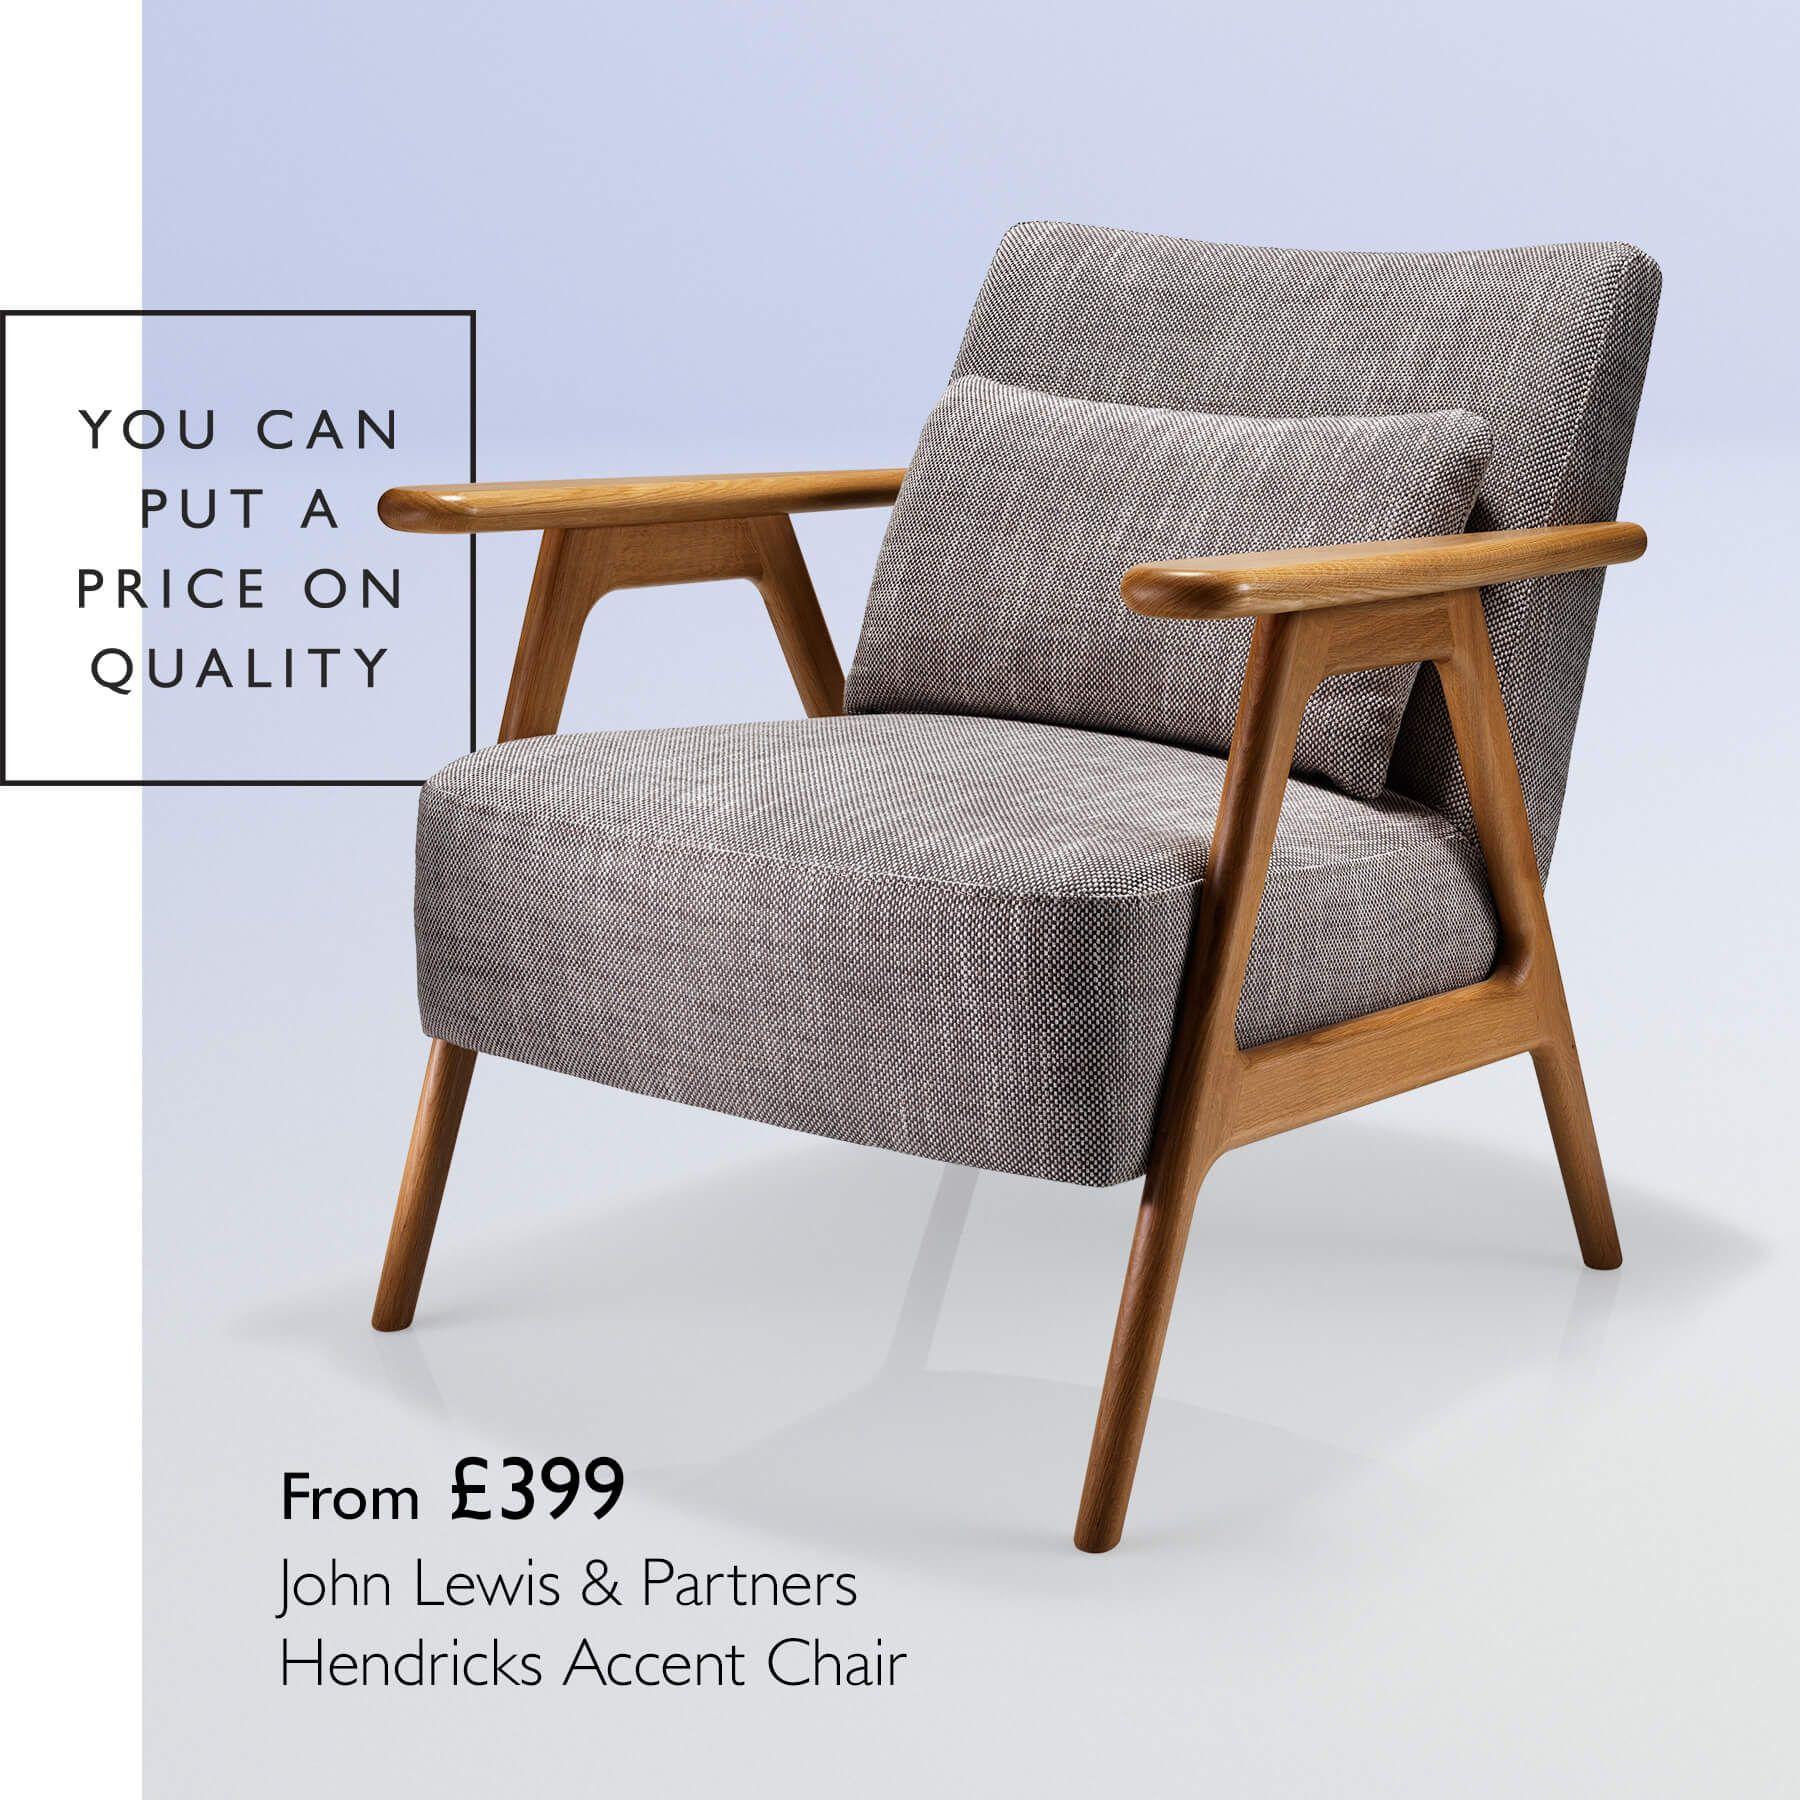 Children Furniture Living Room Lounger Sofa Lounge Chair Folding Lunch Break Chair Parental Chair Bed Bedding Chair